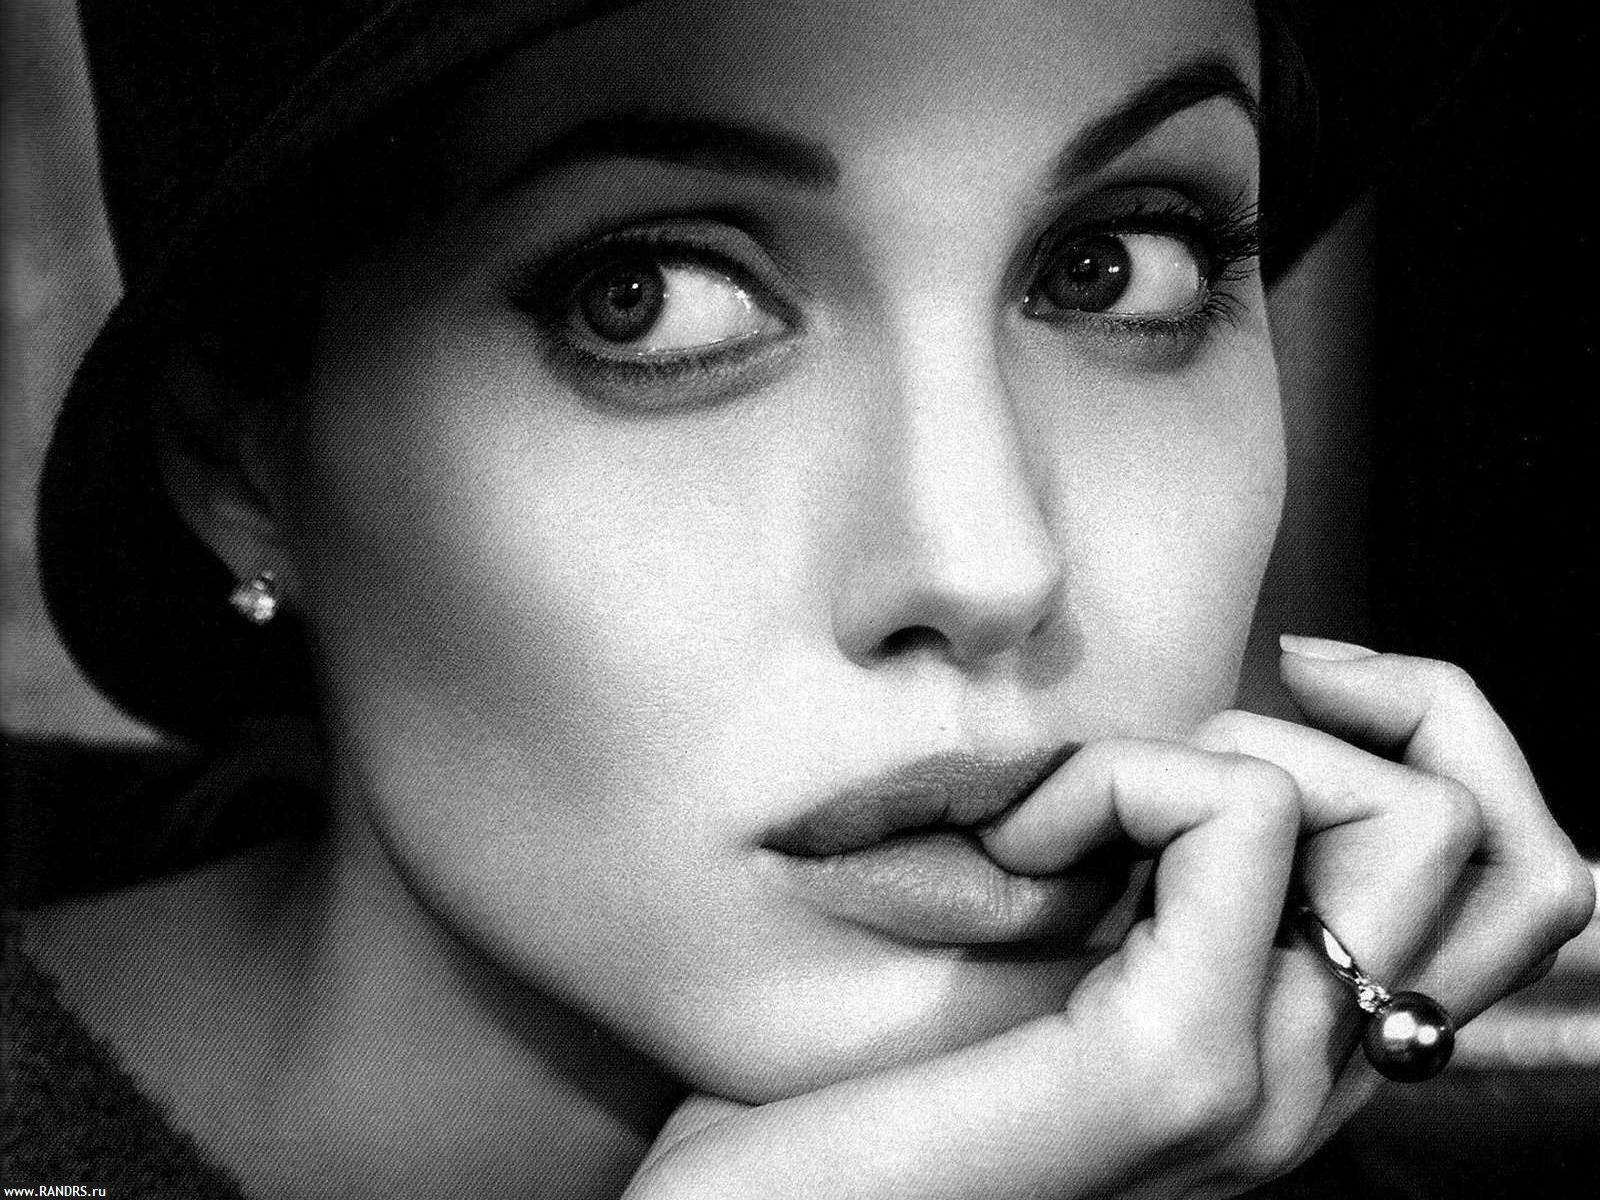 Beauty Woman Faces